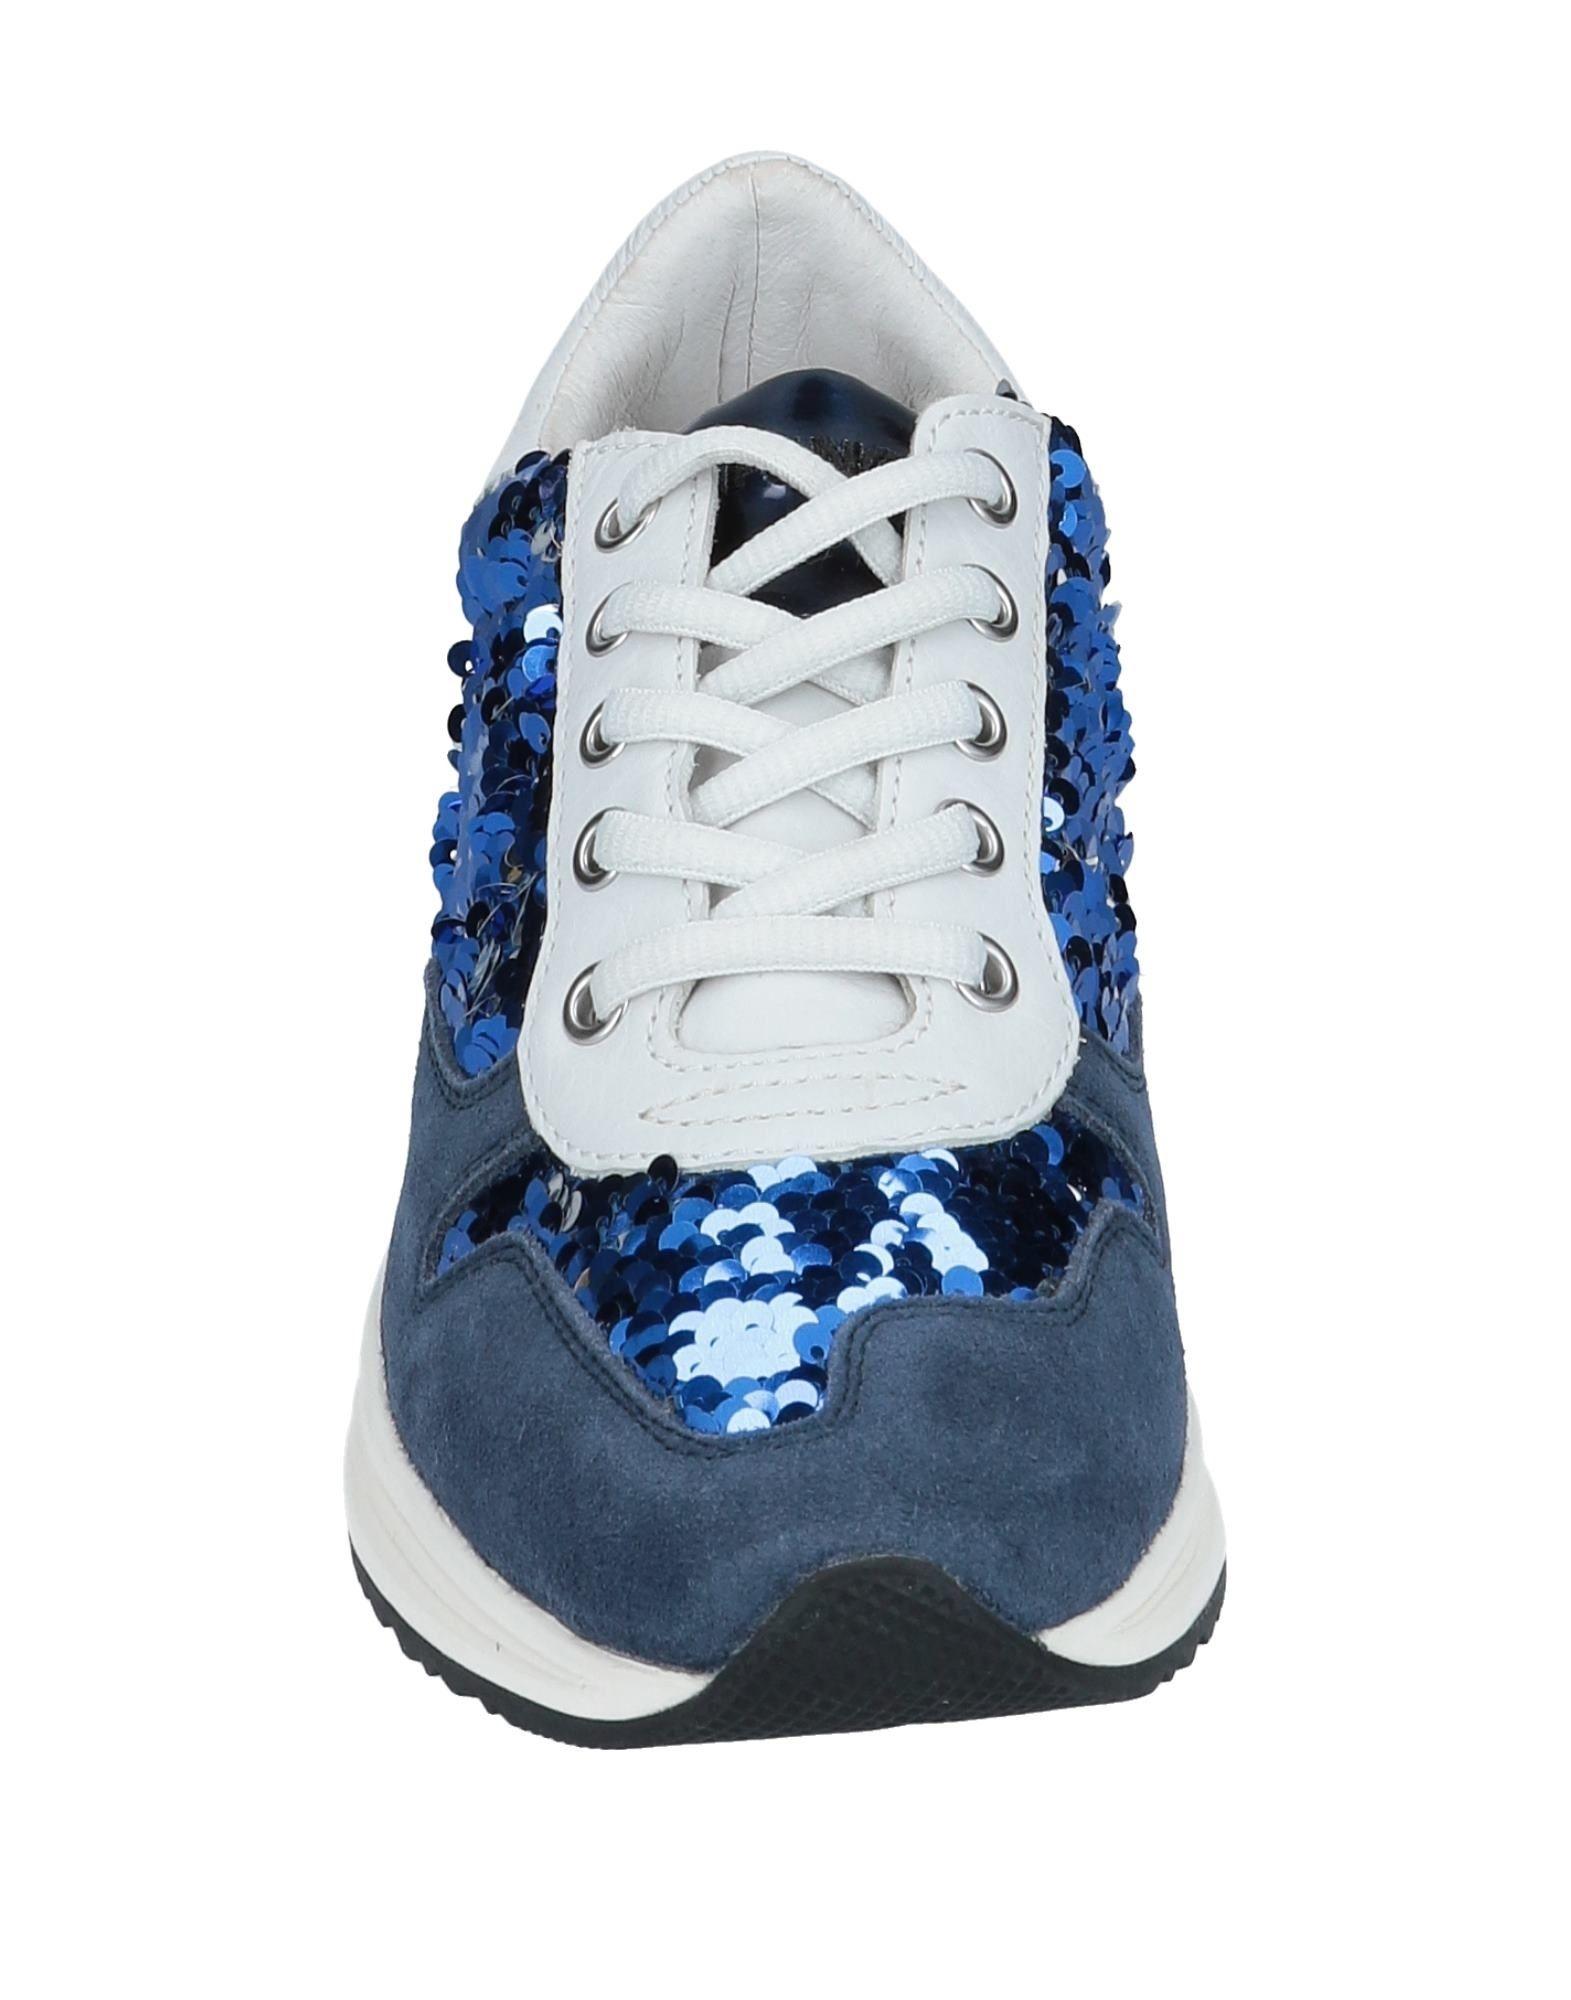 Cafènoir Sneakers Damen Damen Sneakers  11144159VI  c15c24